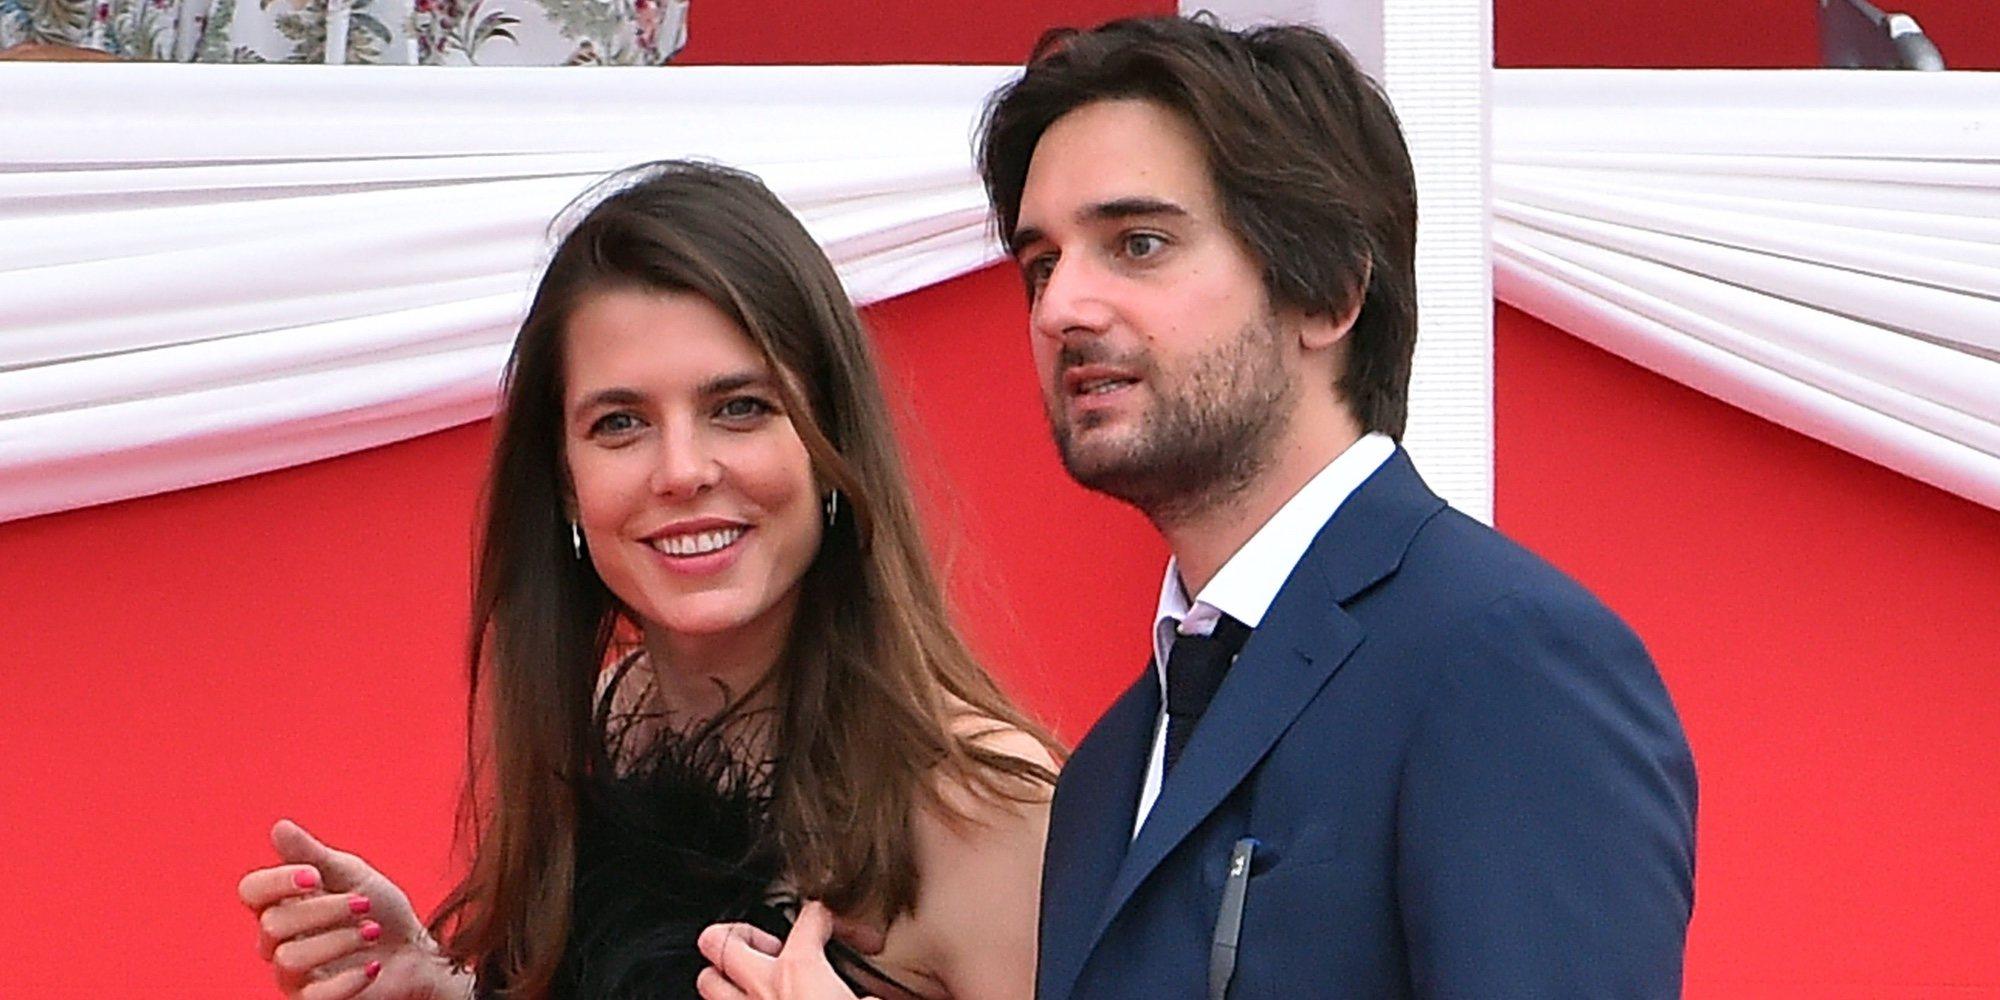 Los detalles de la boda de Carlota Casiraghi y Dimitri Rassam